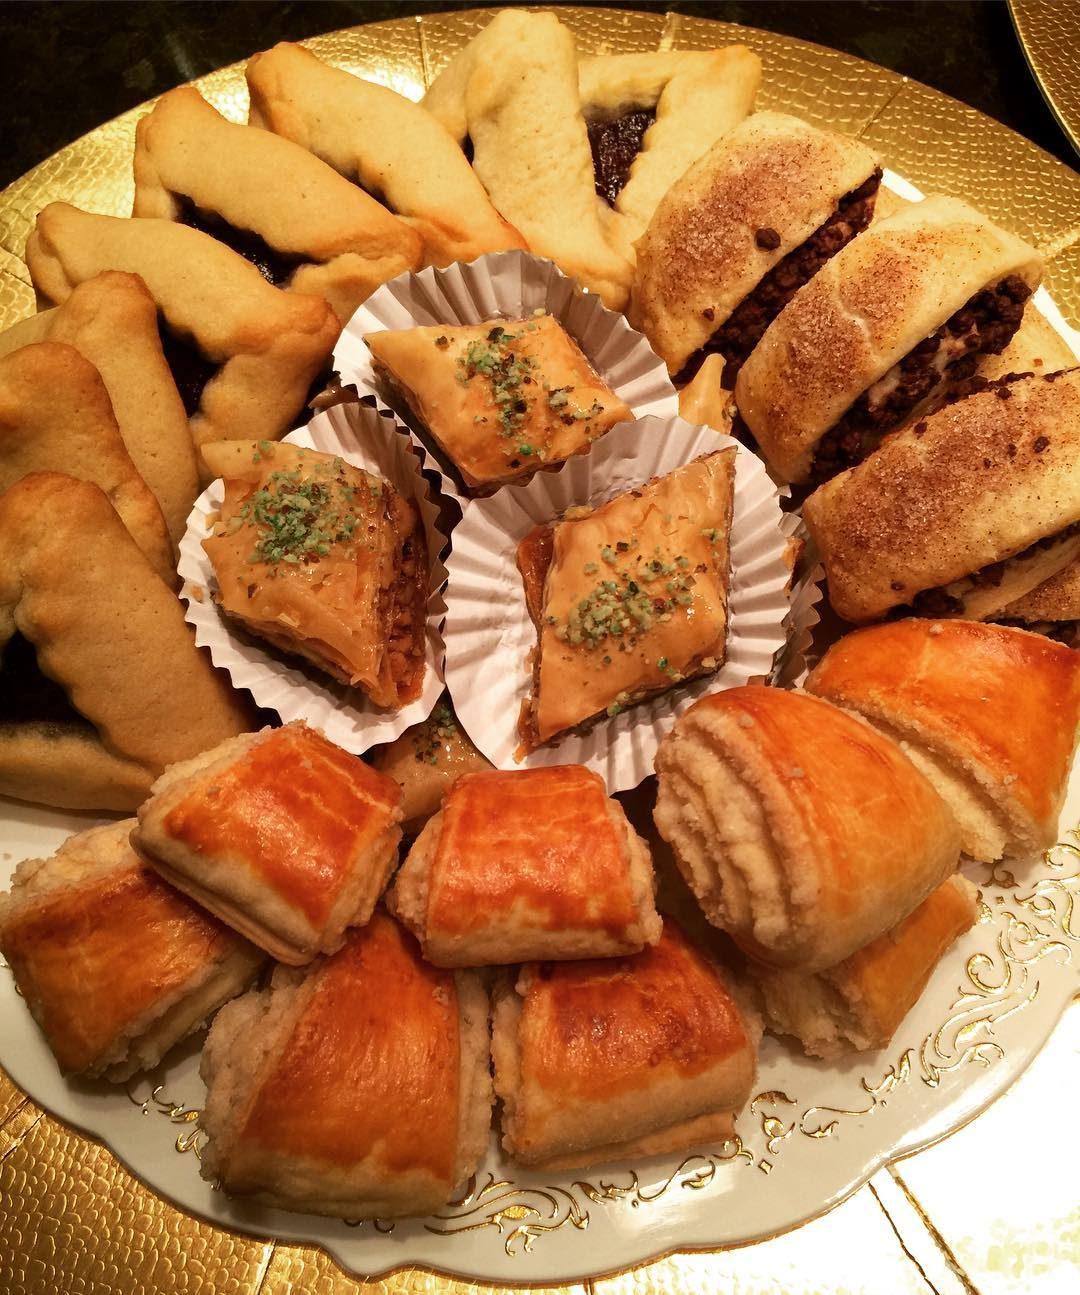 Nazoog,Hamentashen,Chocolate Rugelach and Baklava